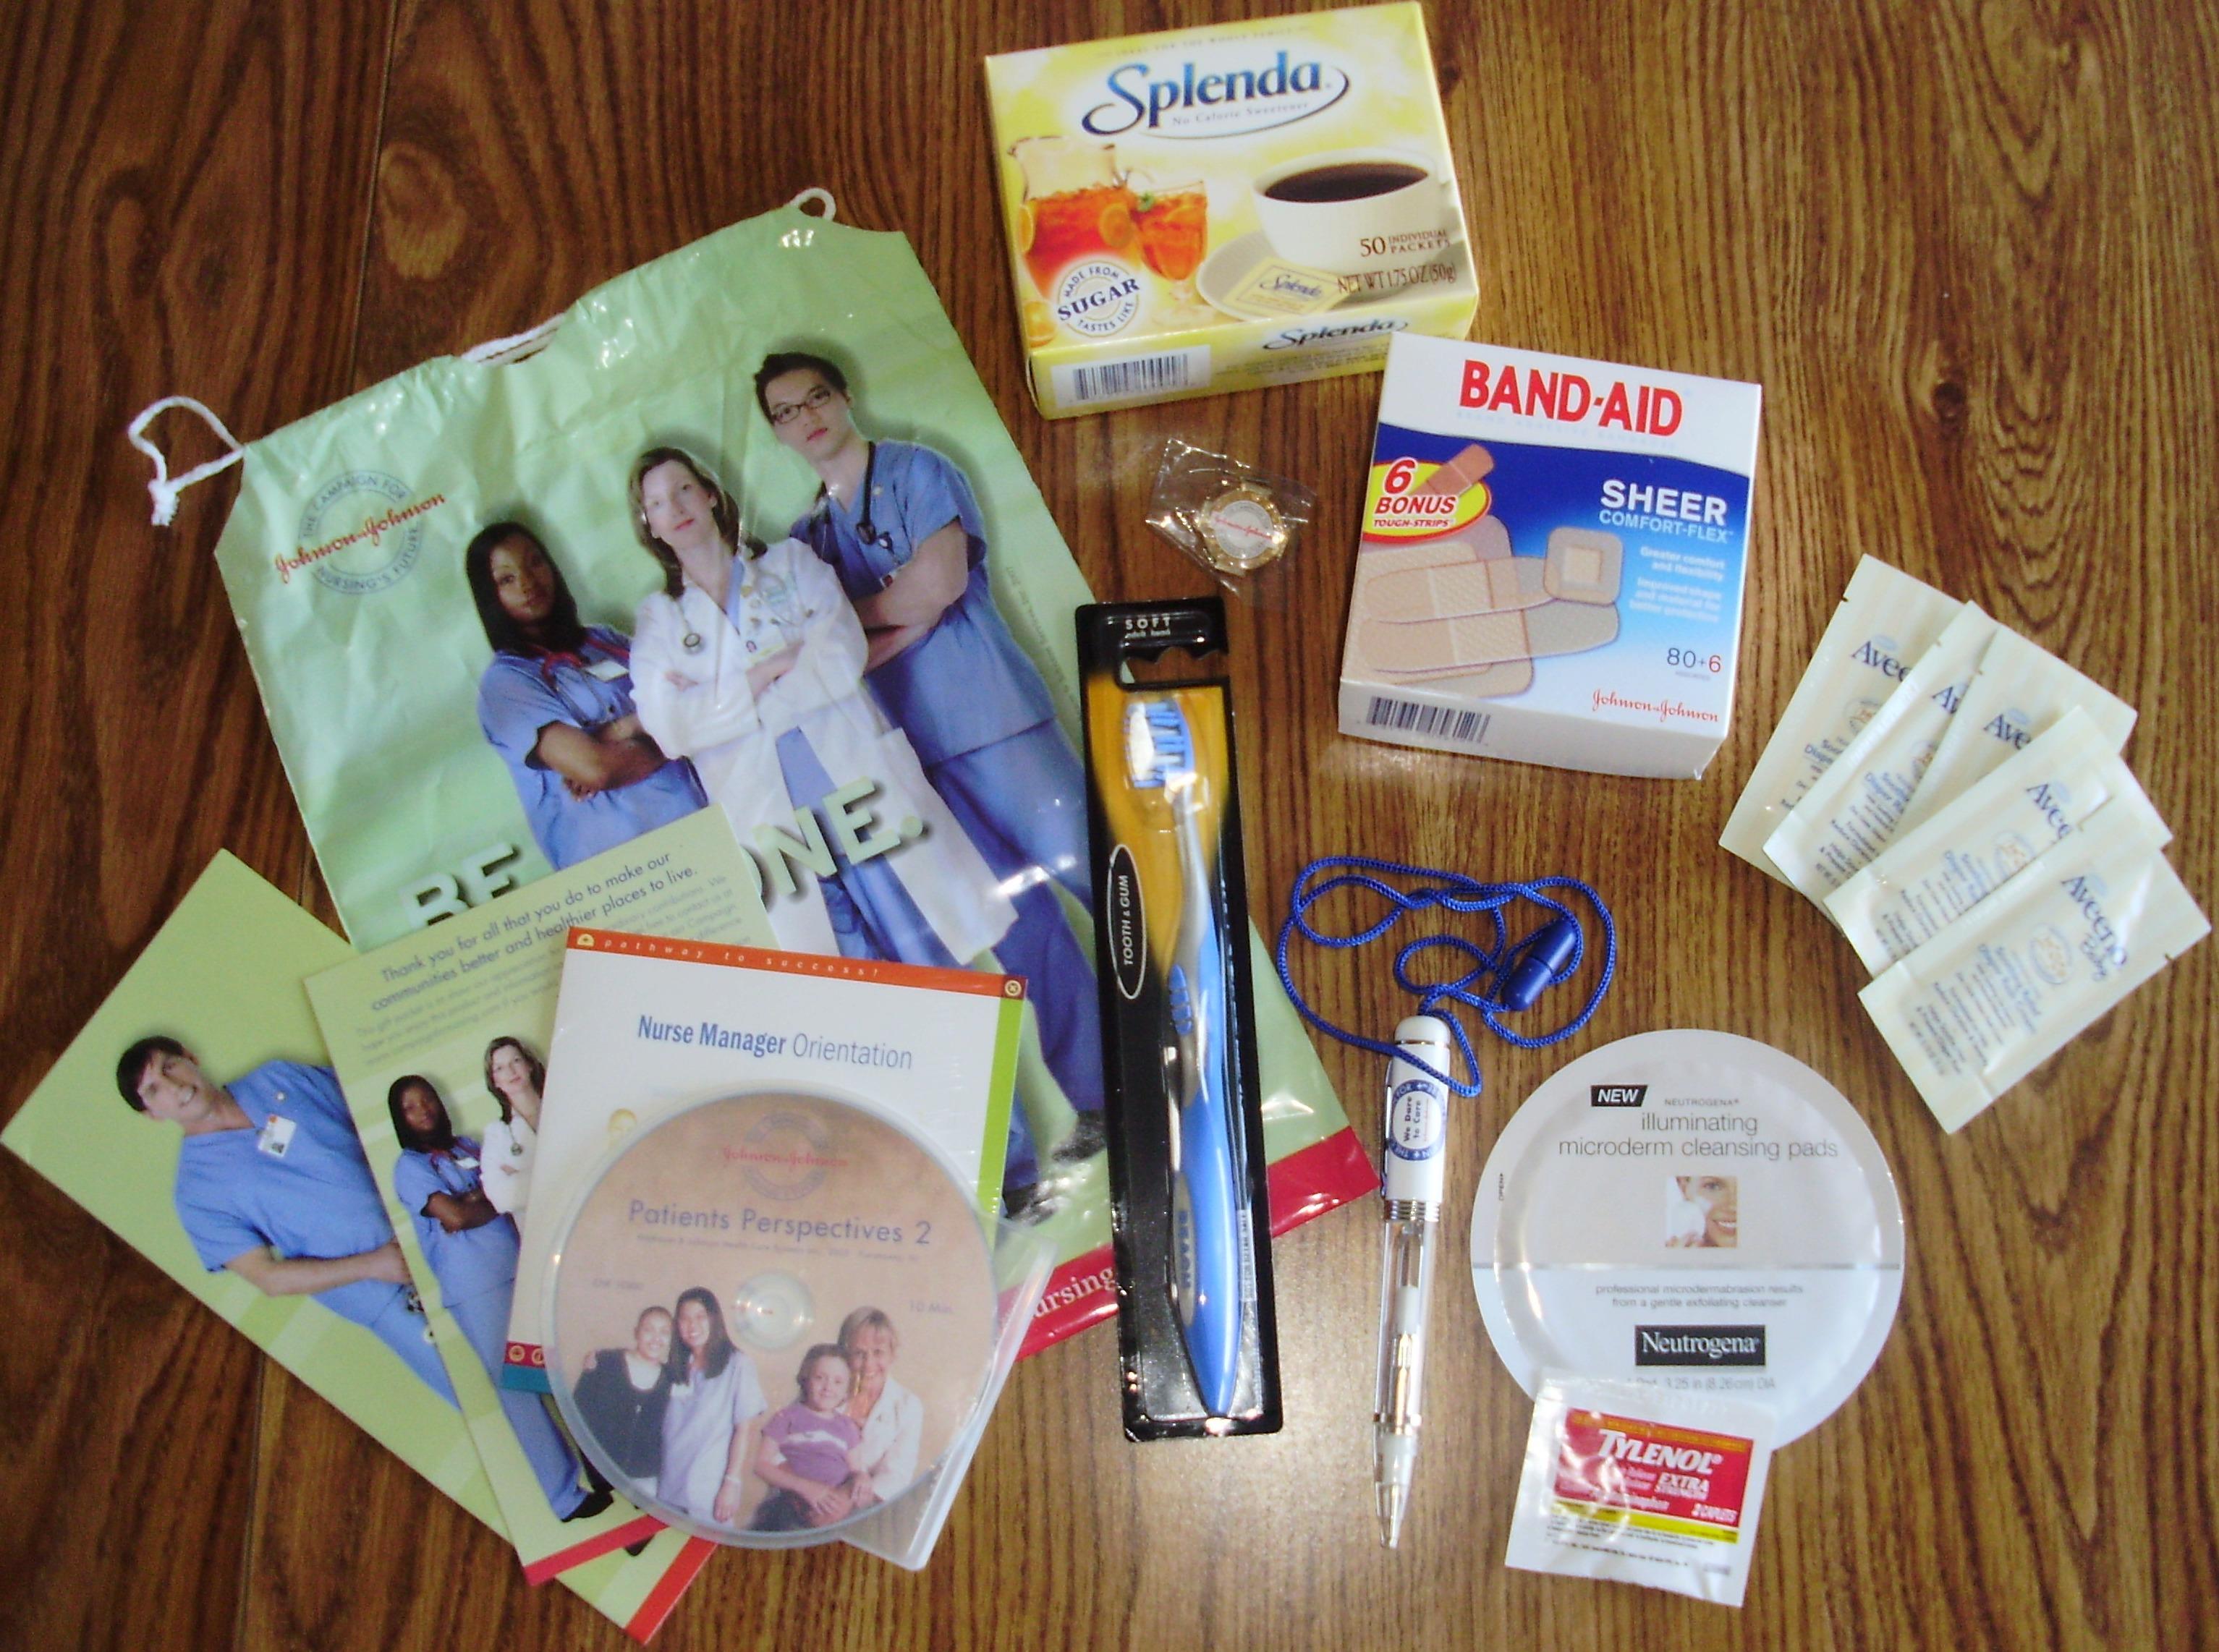 johnson  u0026 johnson nurses kit  u2022 free stuff times what i got